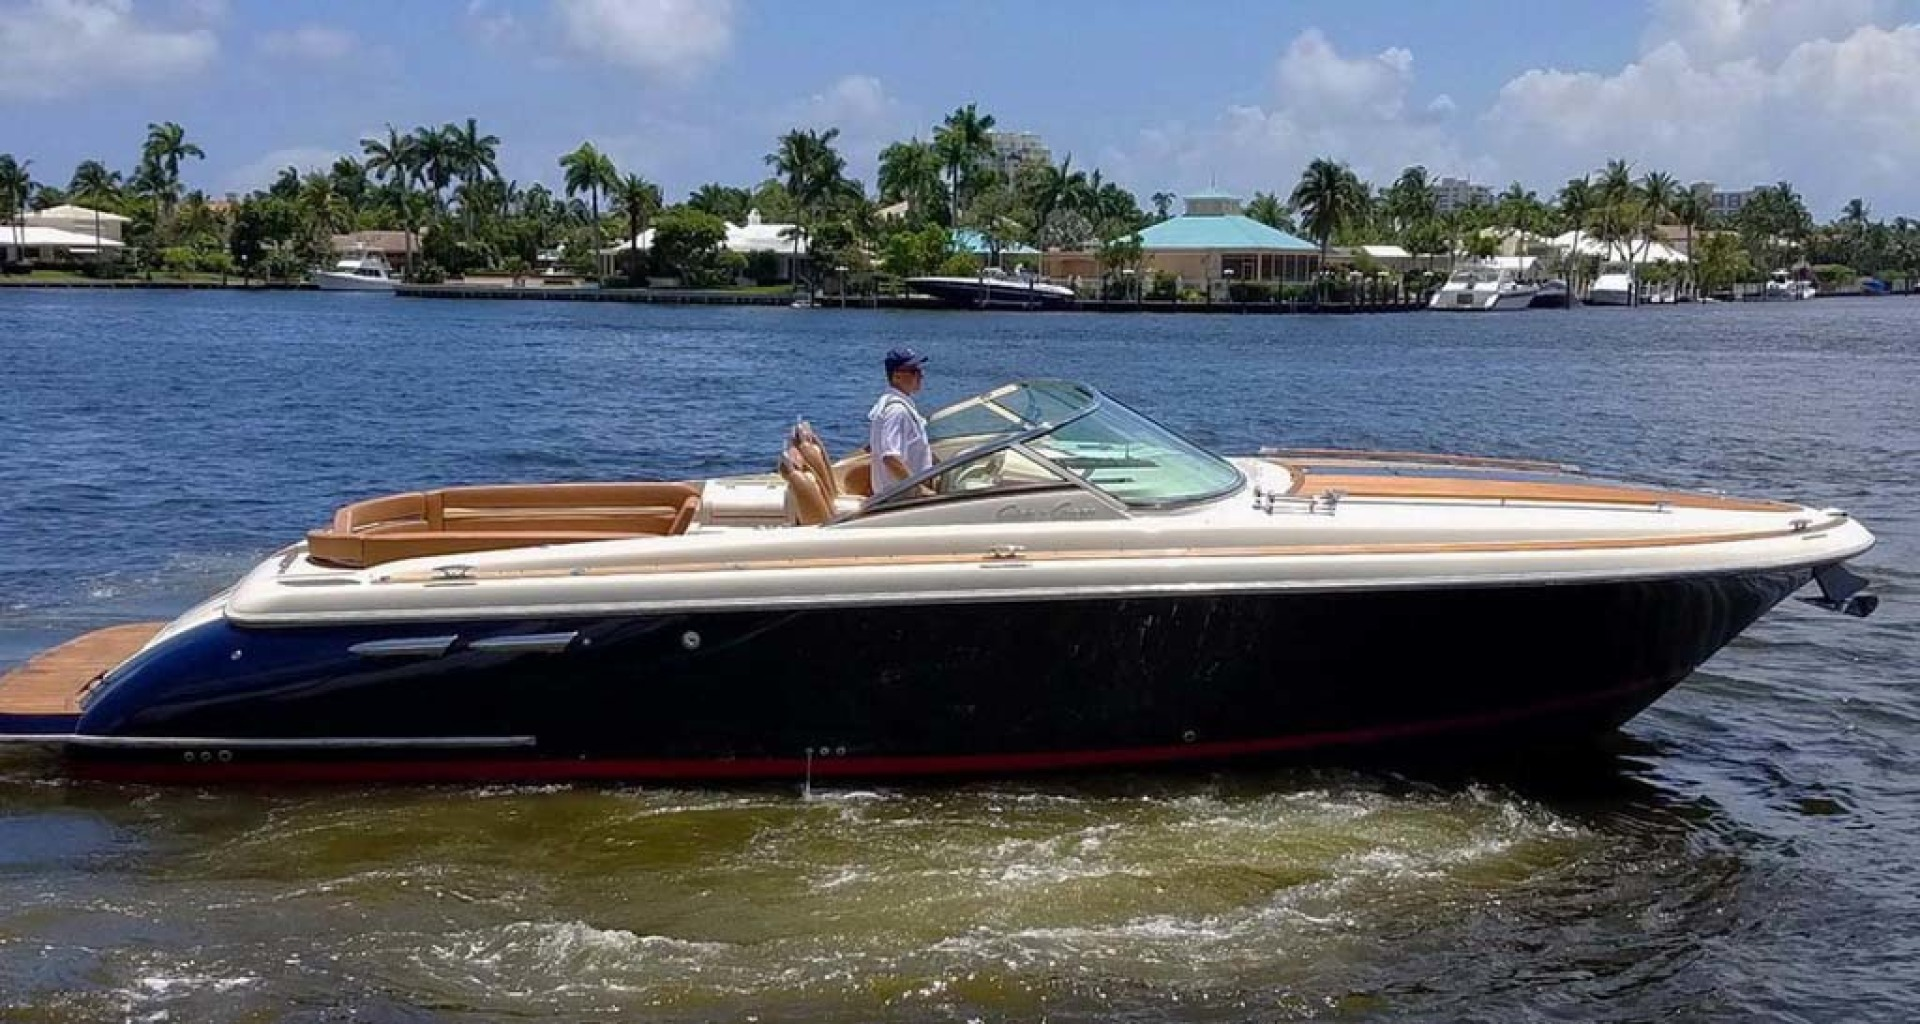 Chris-Craft-Corsair 36 2013-La Dolce Vita Fort Lauderdale-Florida-United States-Starboard View-1074560 | Thumbnail